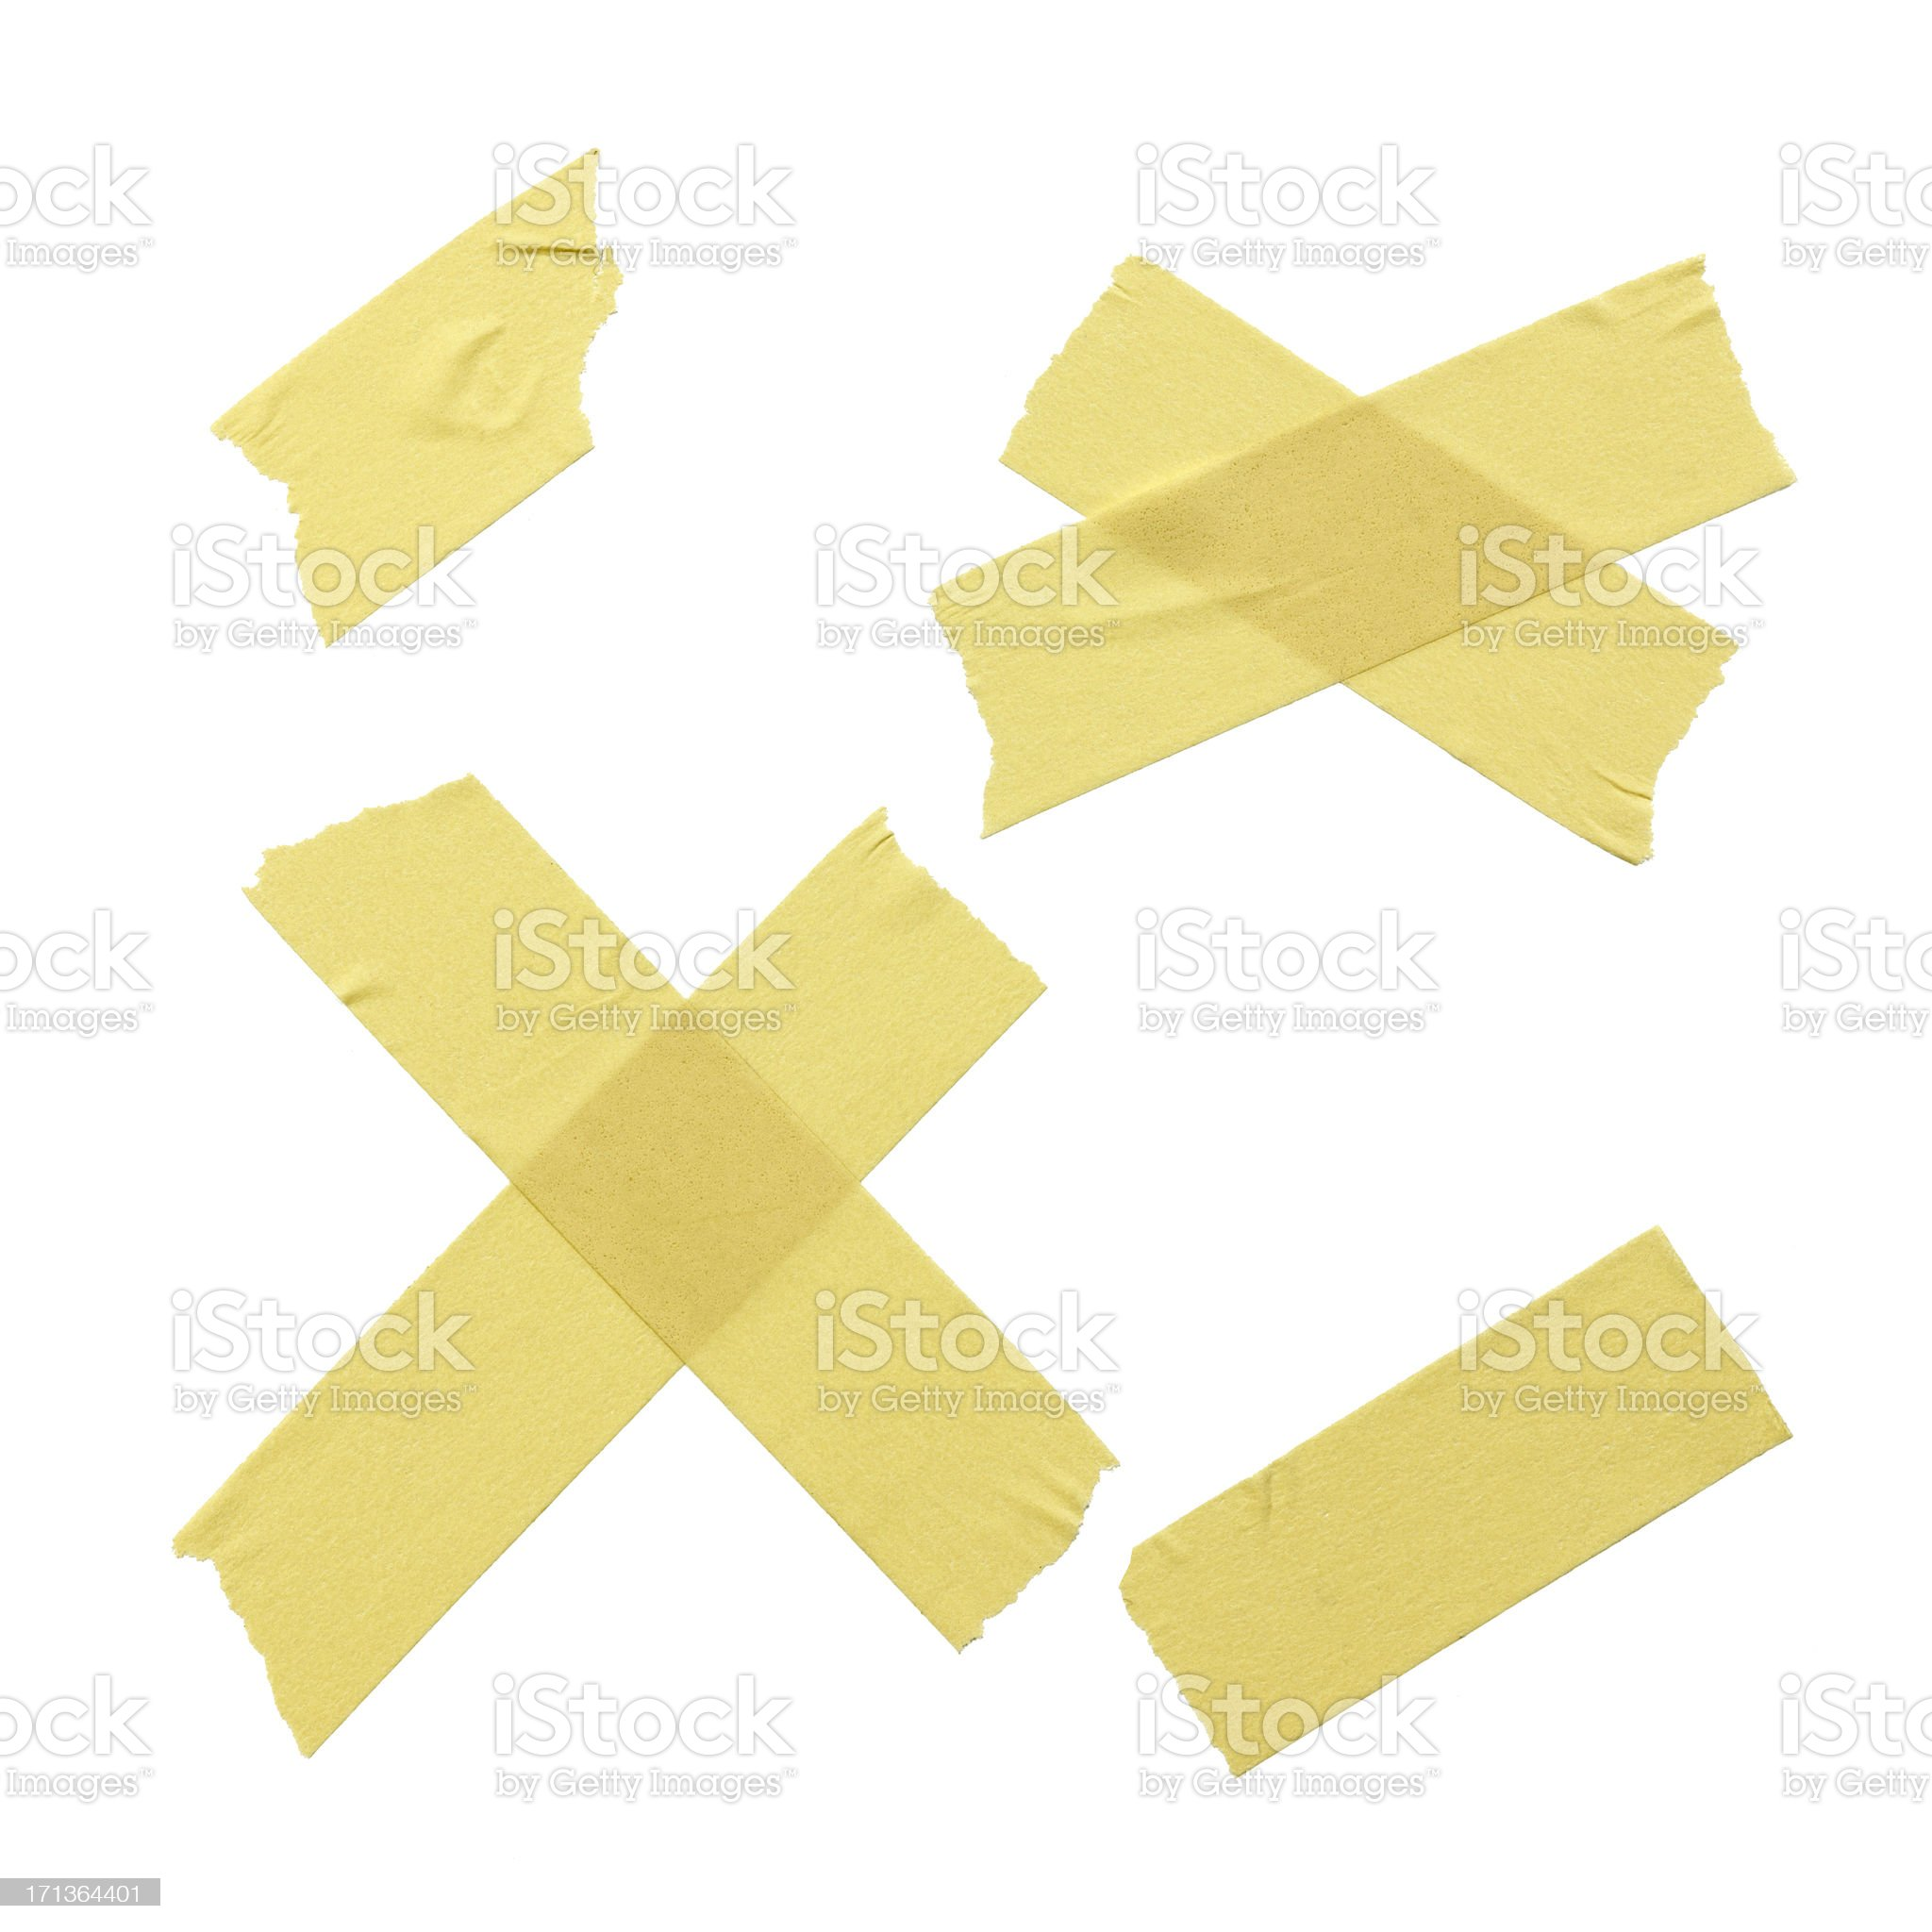 Adhesive Masking Tape royalty-free stock photo